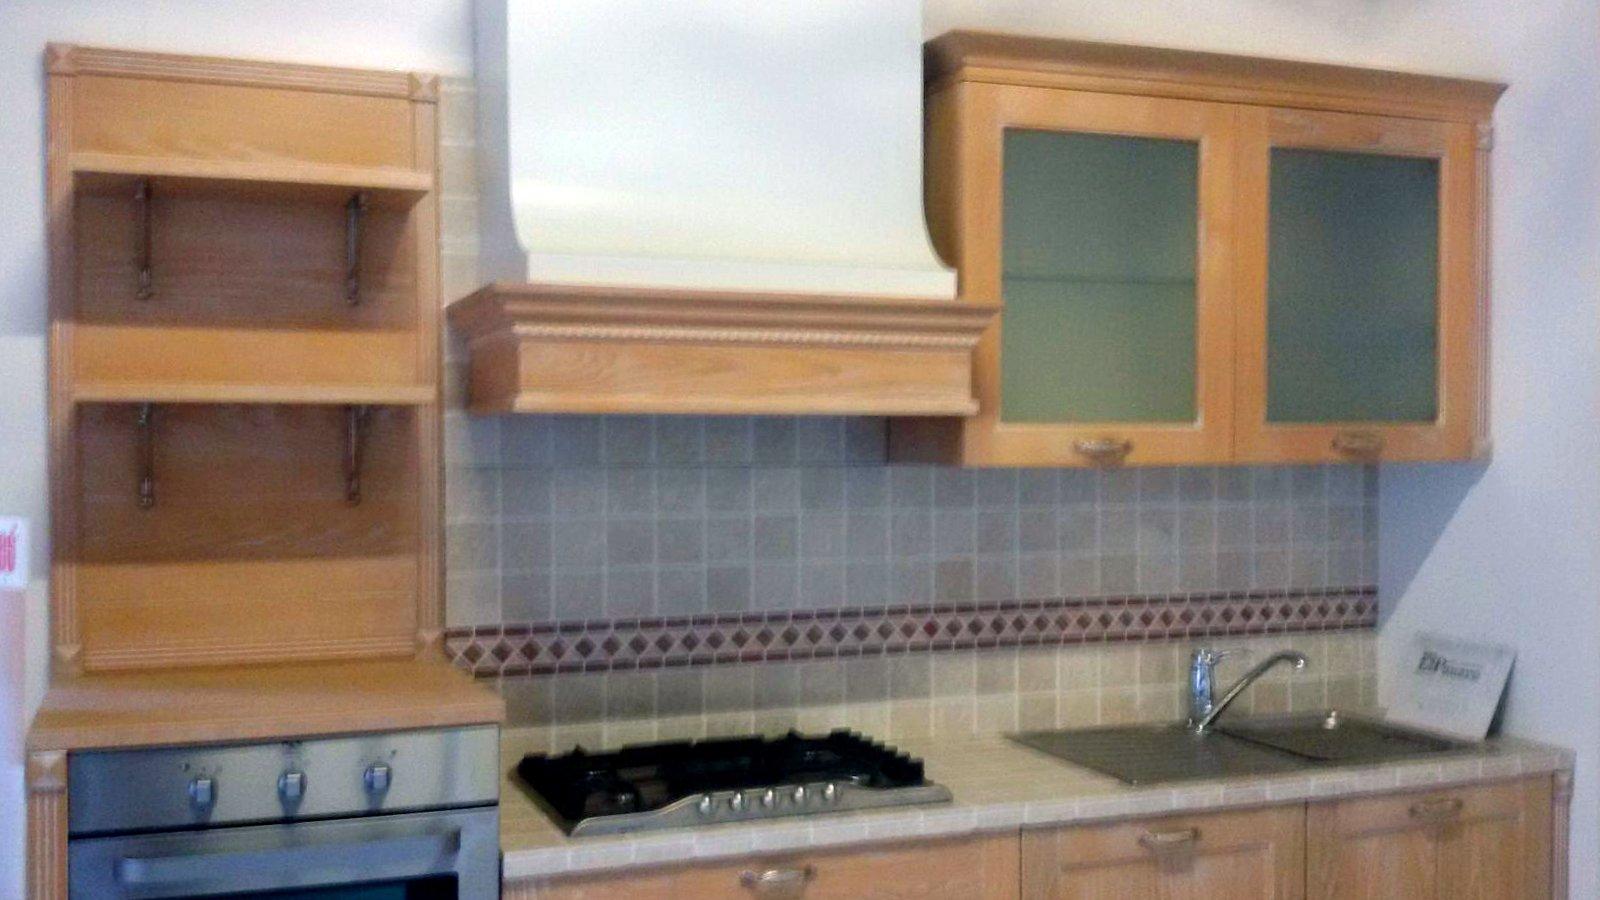 Promozioni arredamento pietra ligure mobili panaro for Promozioni arredamento